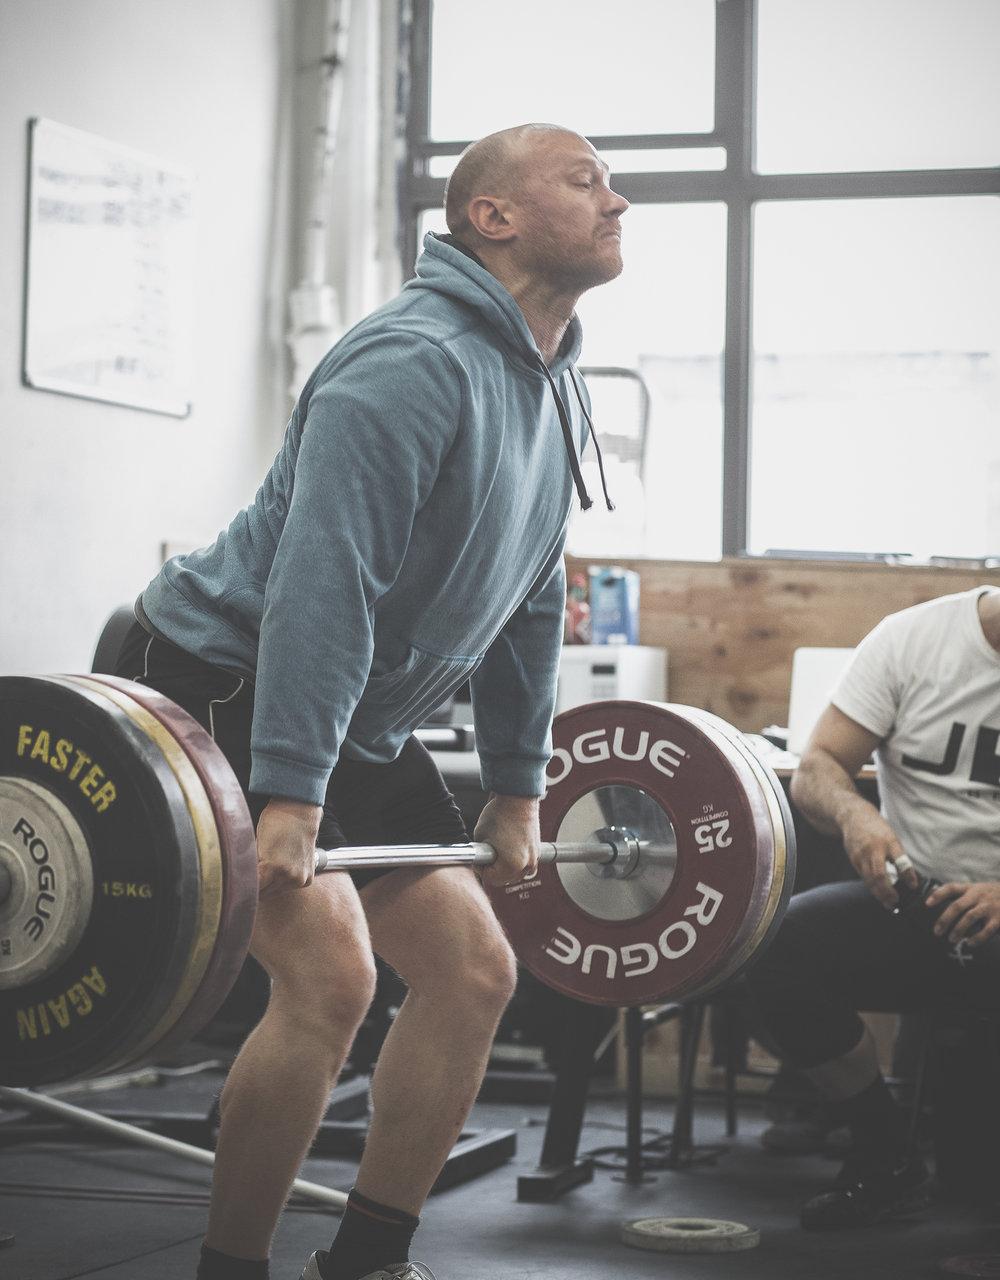 yasha-kahn-weightlifting-coach-7.jpg